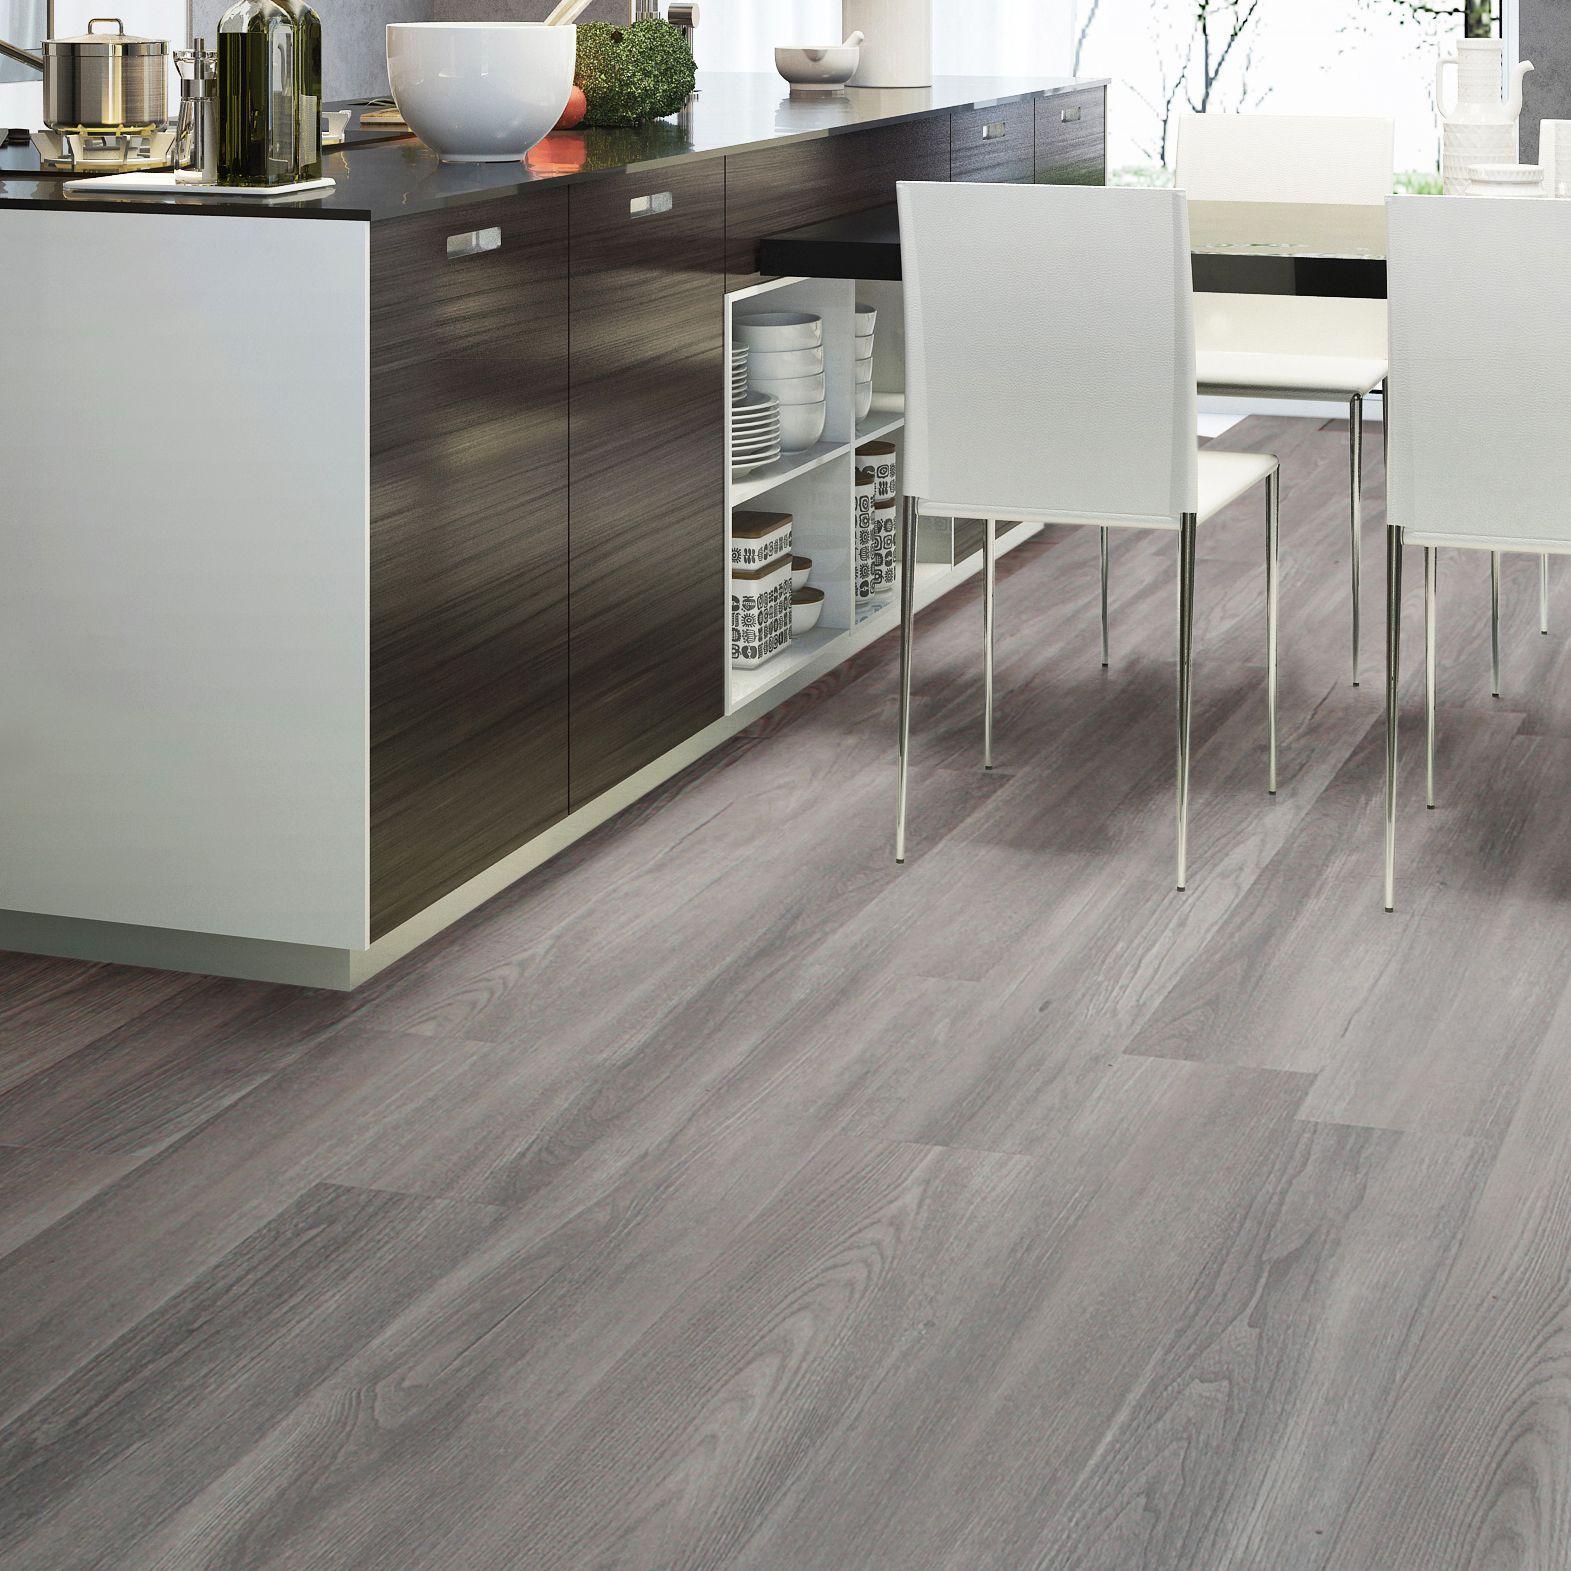 Colours grey natural oak effect waterproof luxury vinyl click grey natural oak effect waterproof luxury vinyl click flooring 220m pack departments diy dailygadgetfo Images